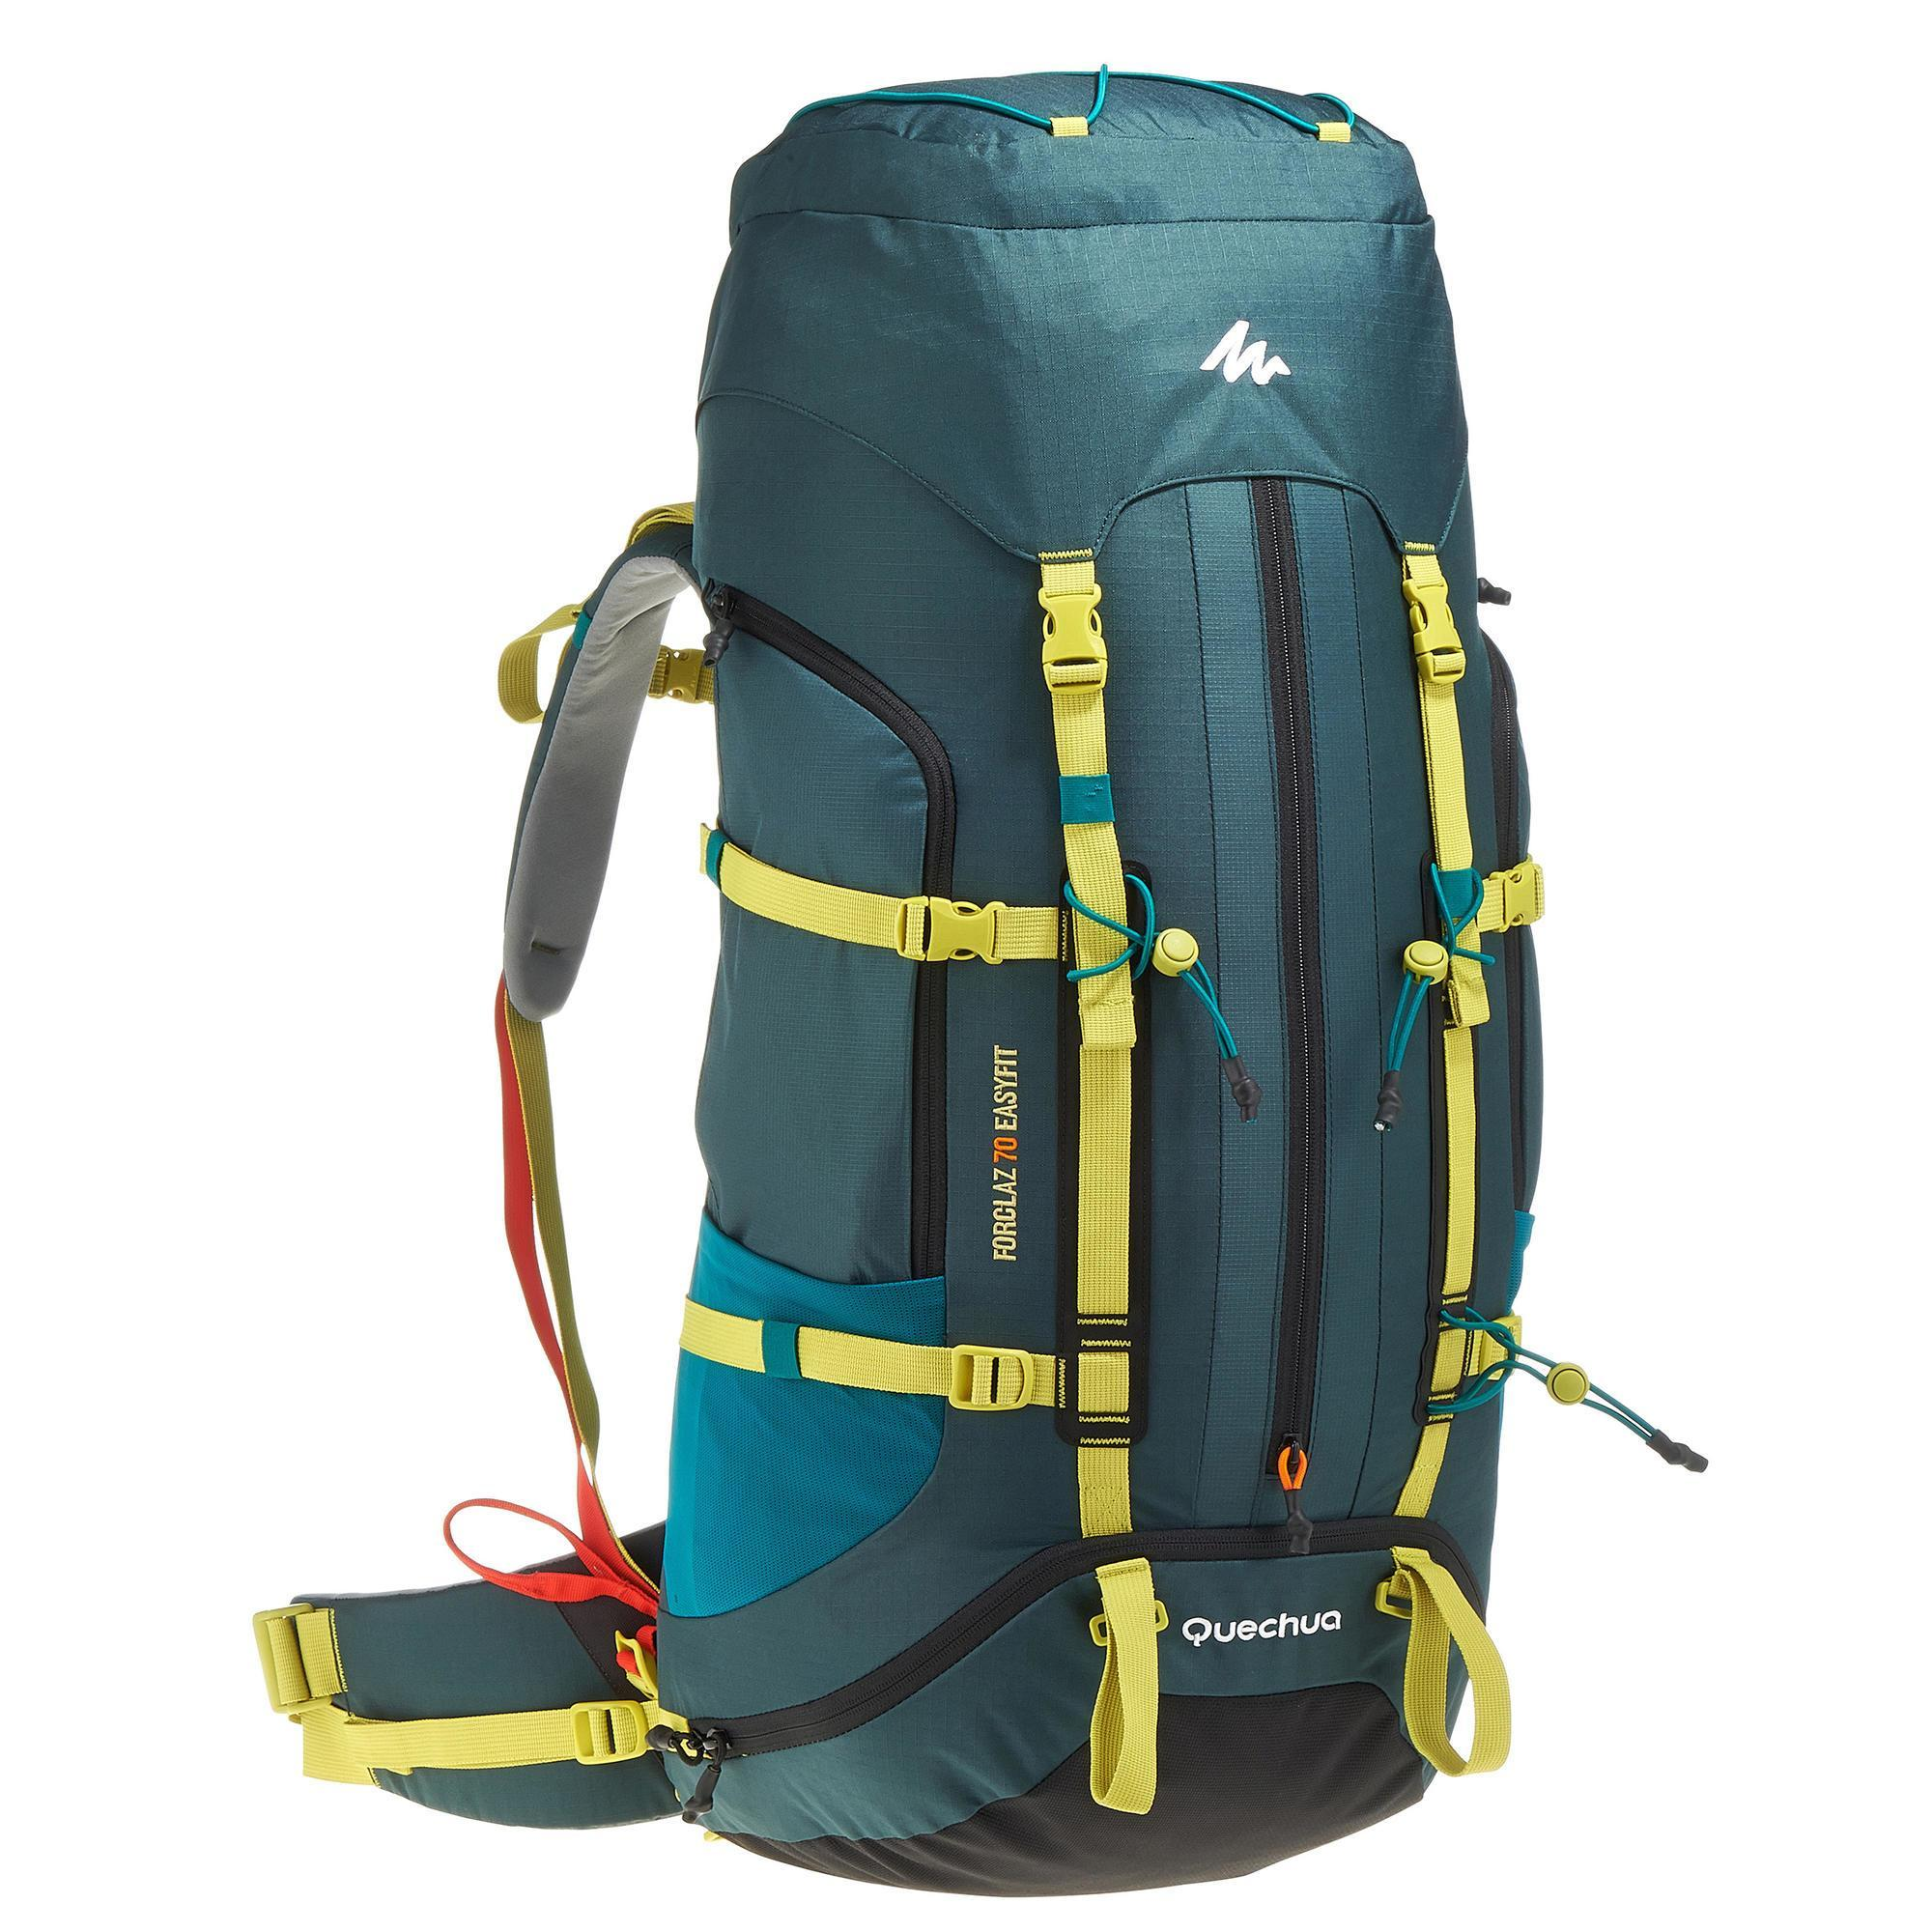 1177e8025a2 Quechua Bergsport rugzak voor heren Easyfit 70 l blauw | Decathlon.nl